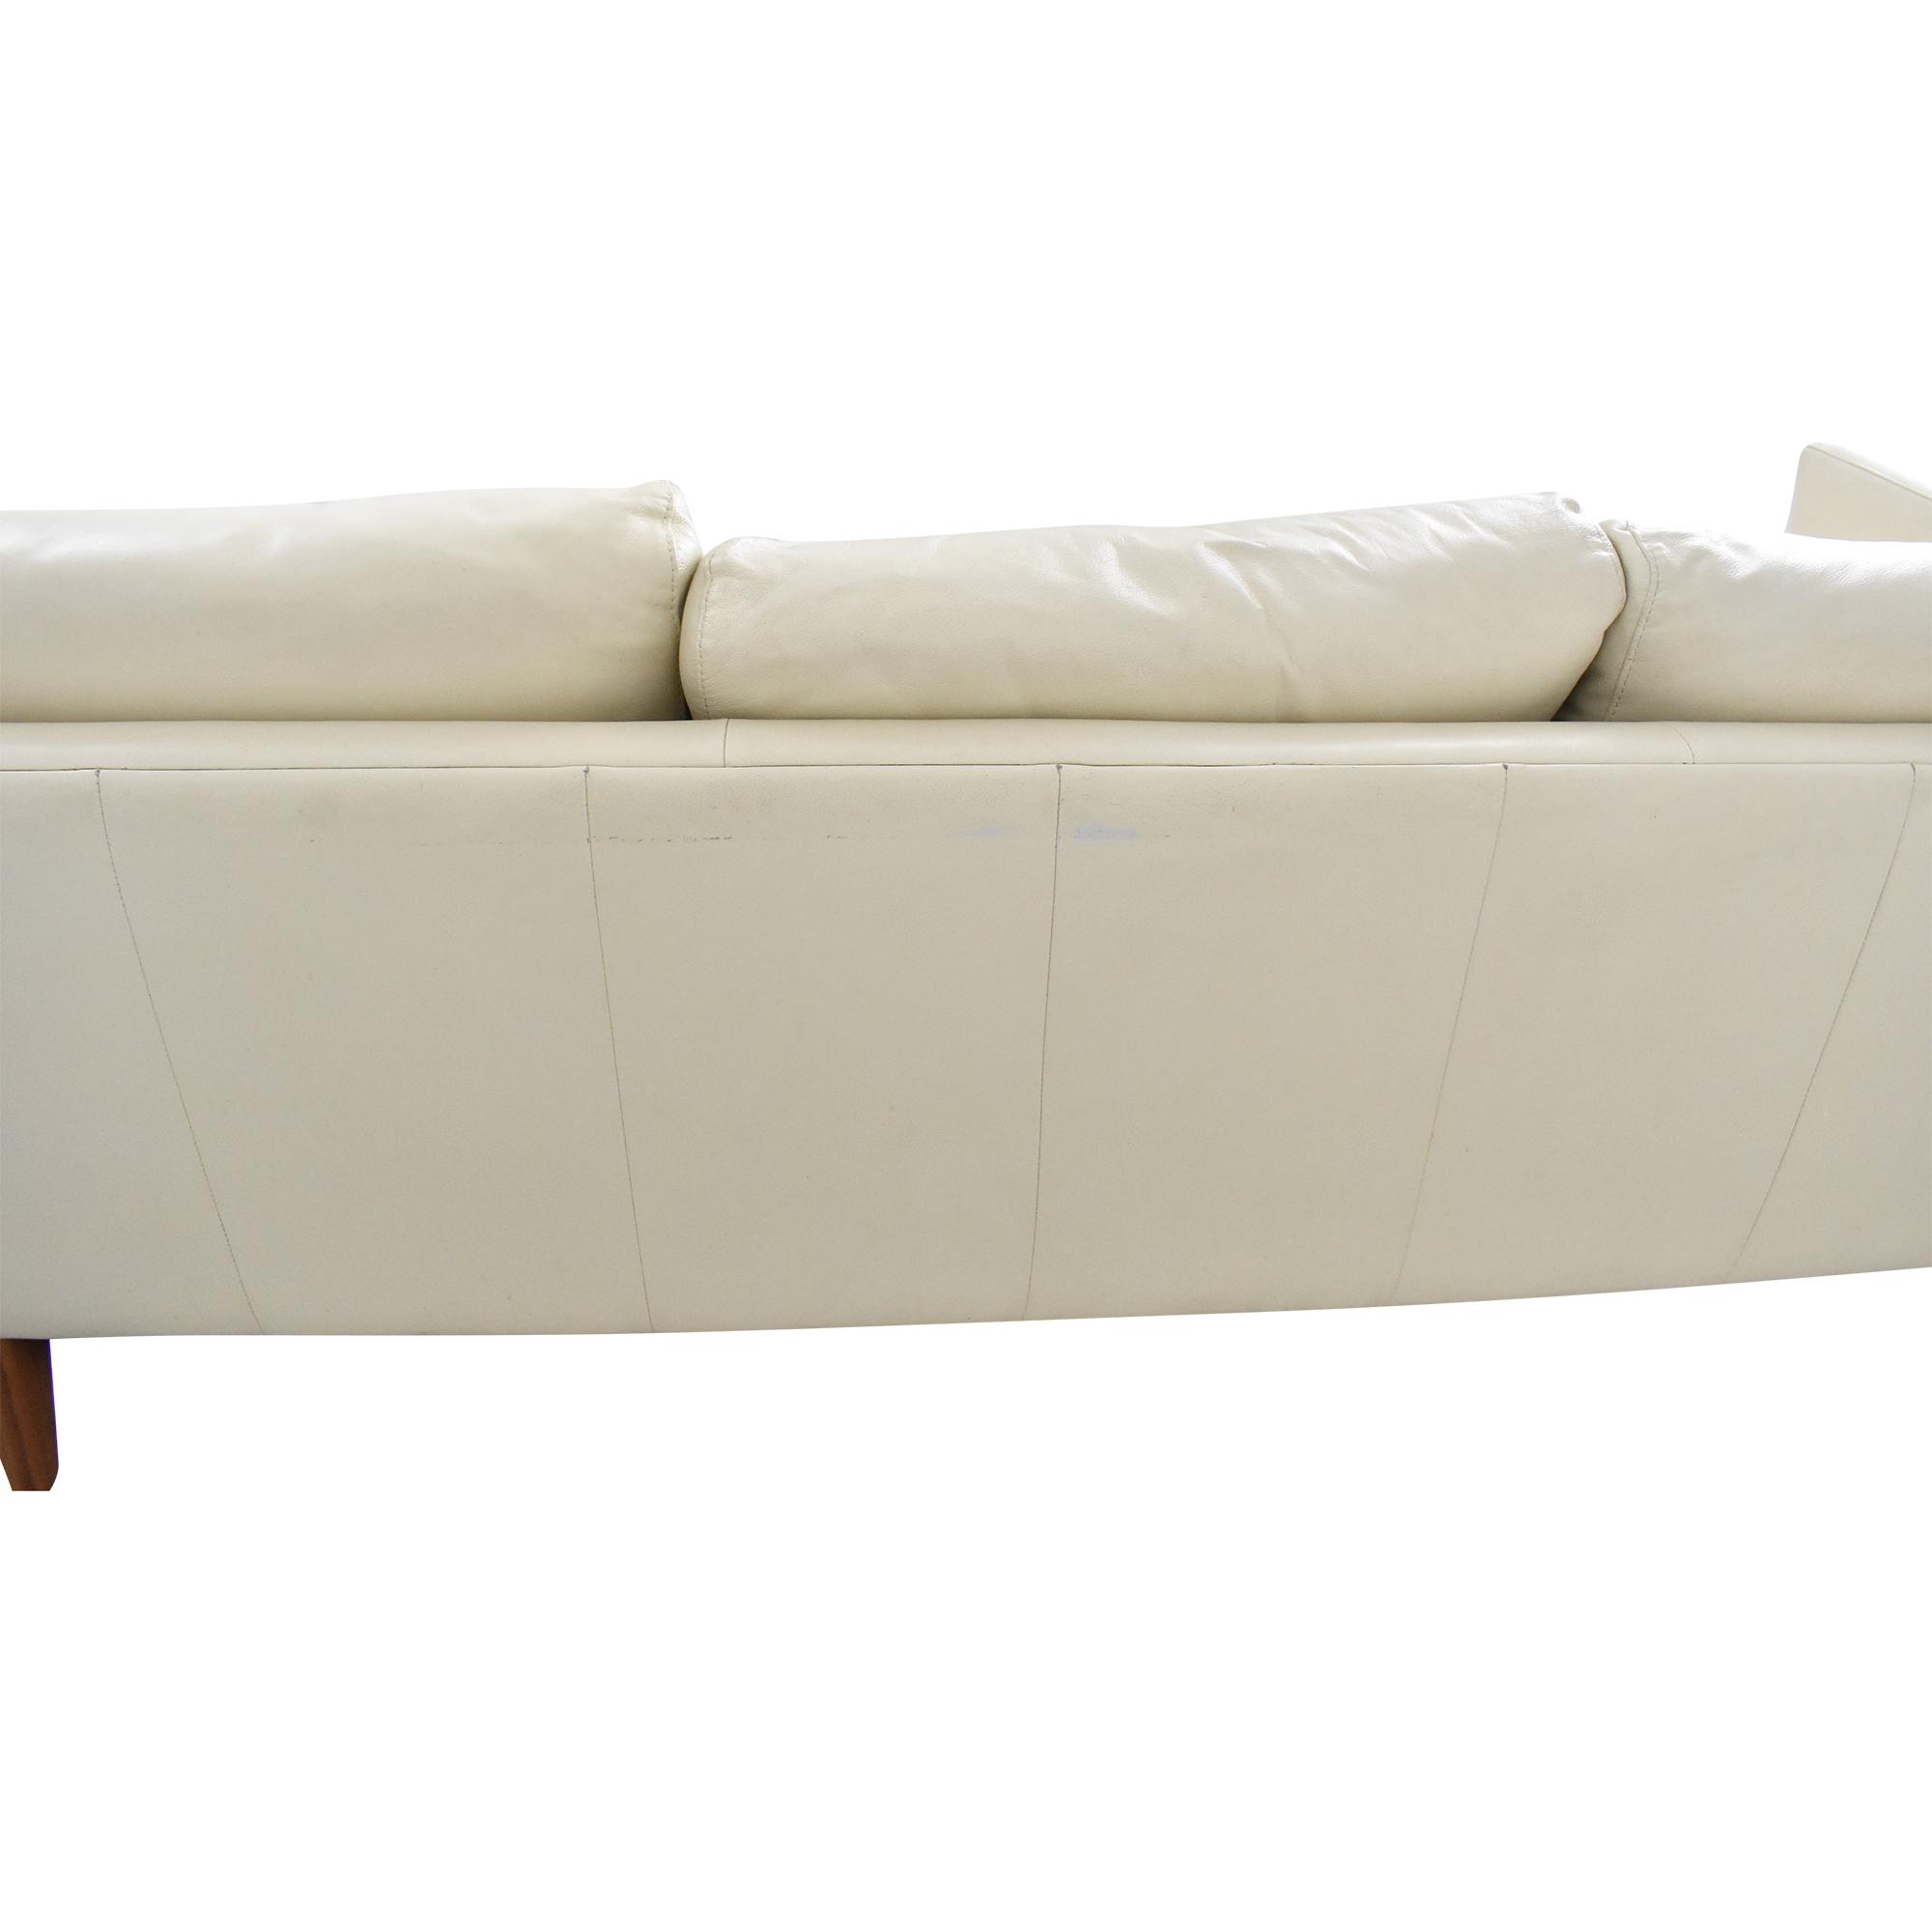 buy Elite Leather Company Burbank Chaise Sectional Sofa Elite Leather Company Sofas